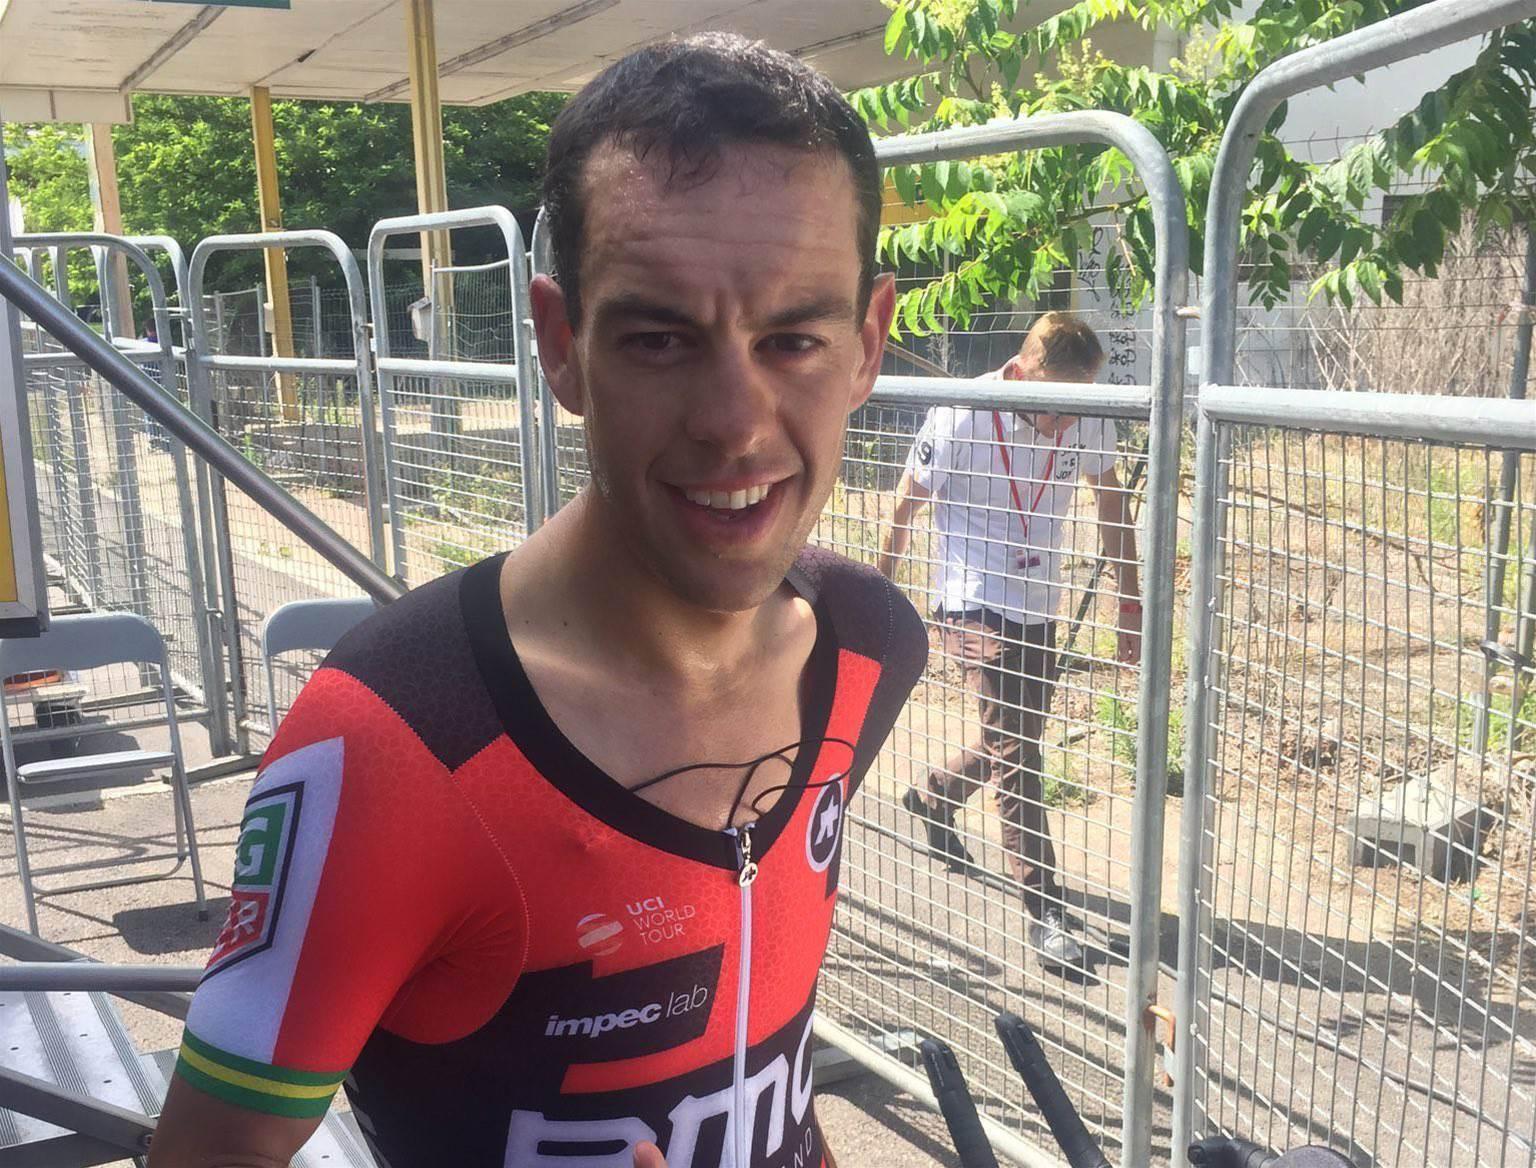 Porte returns to racing after Tour de France crash